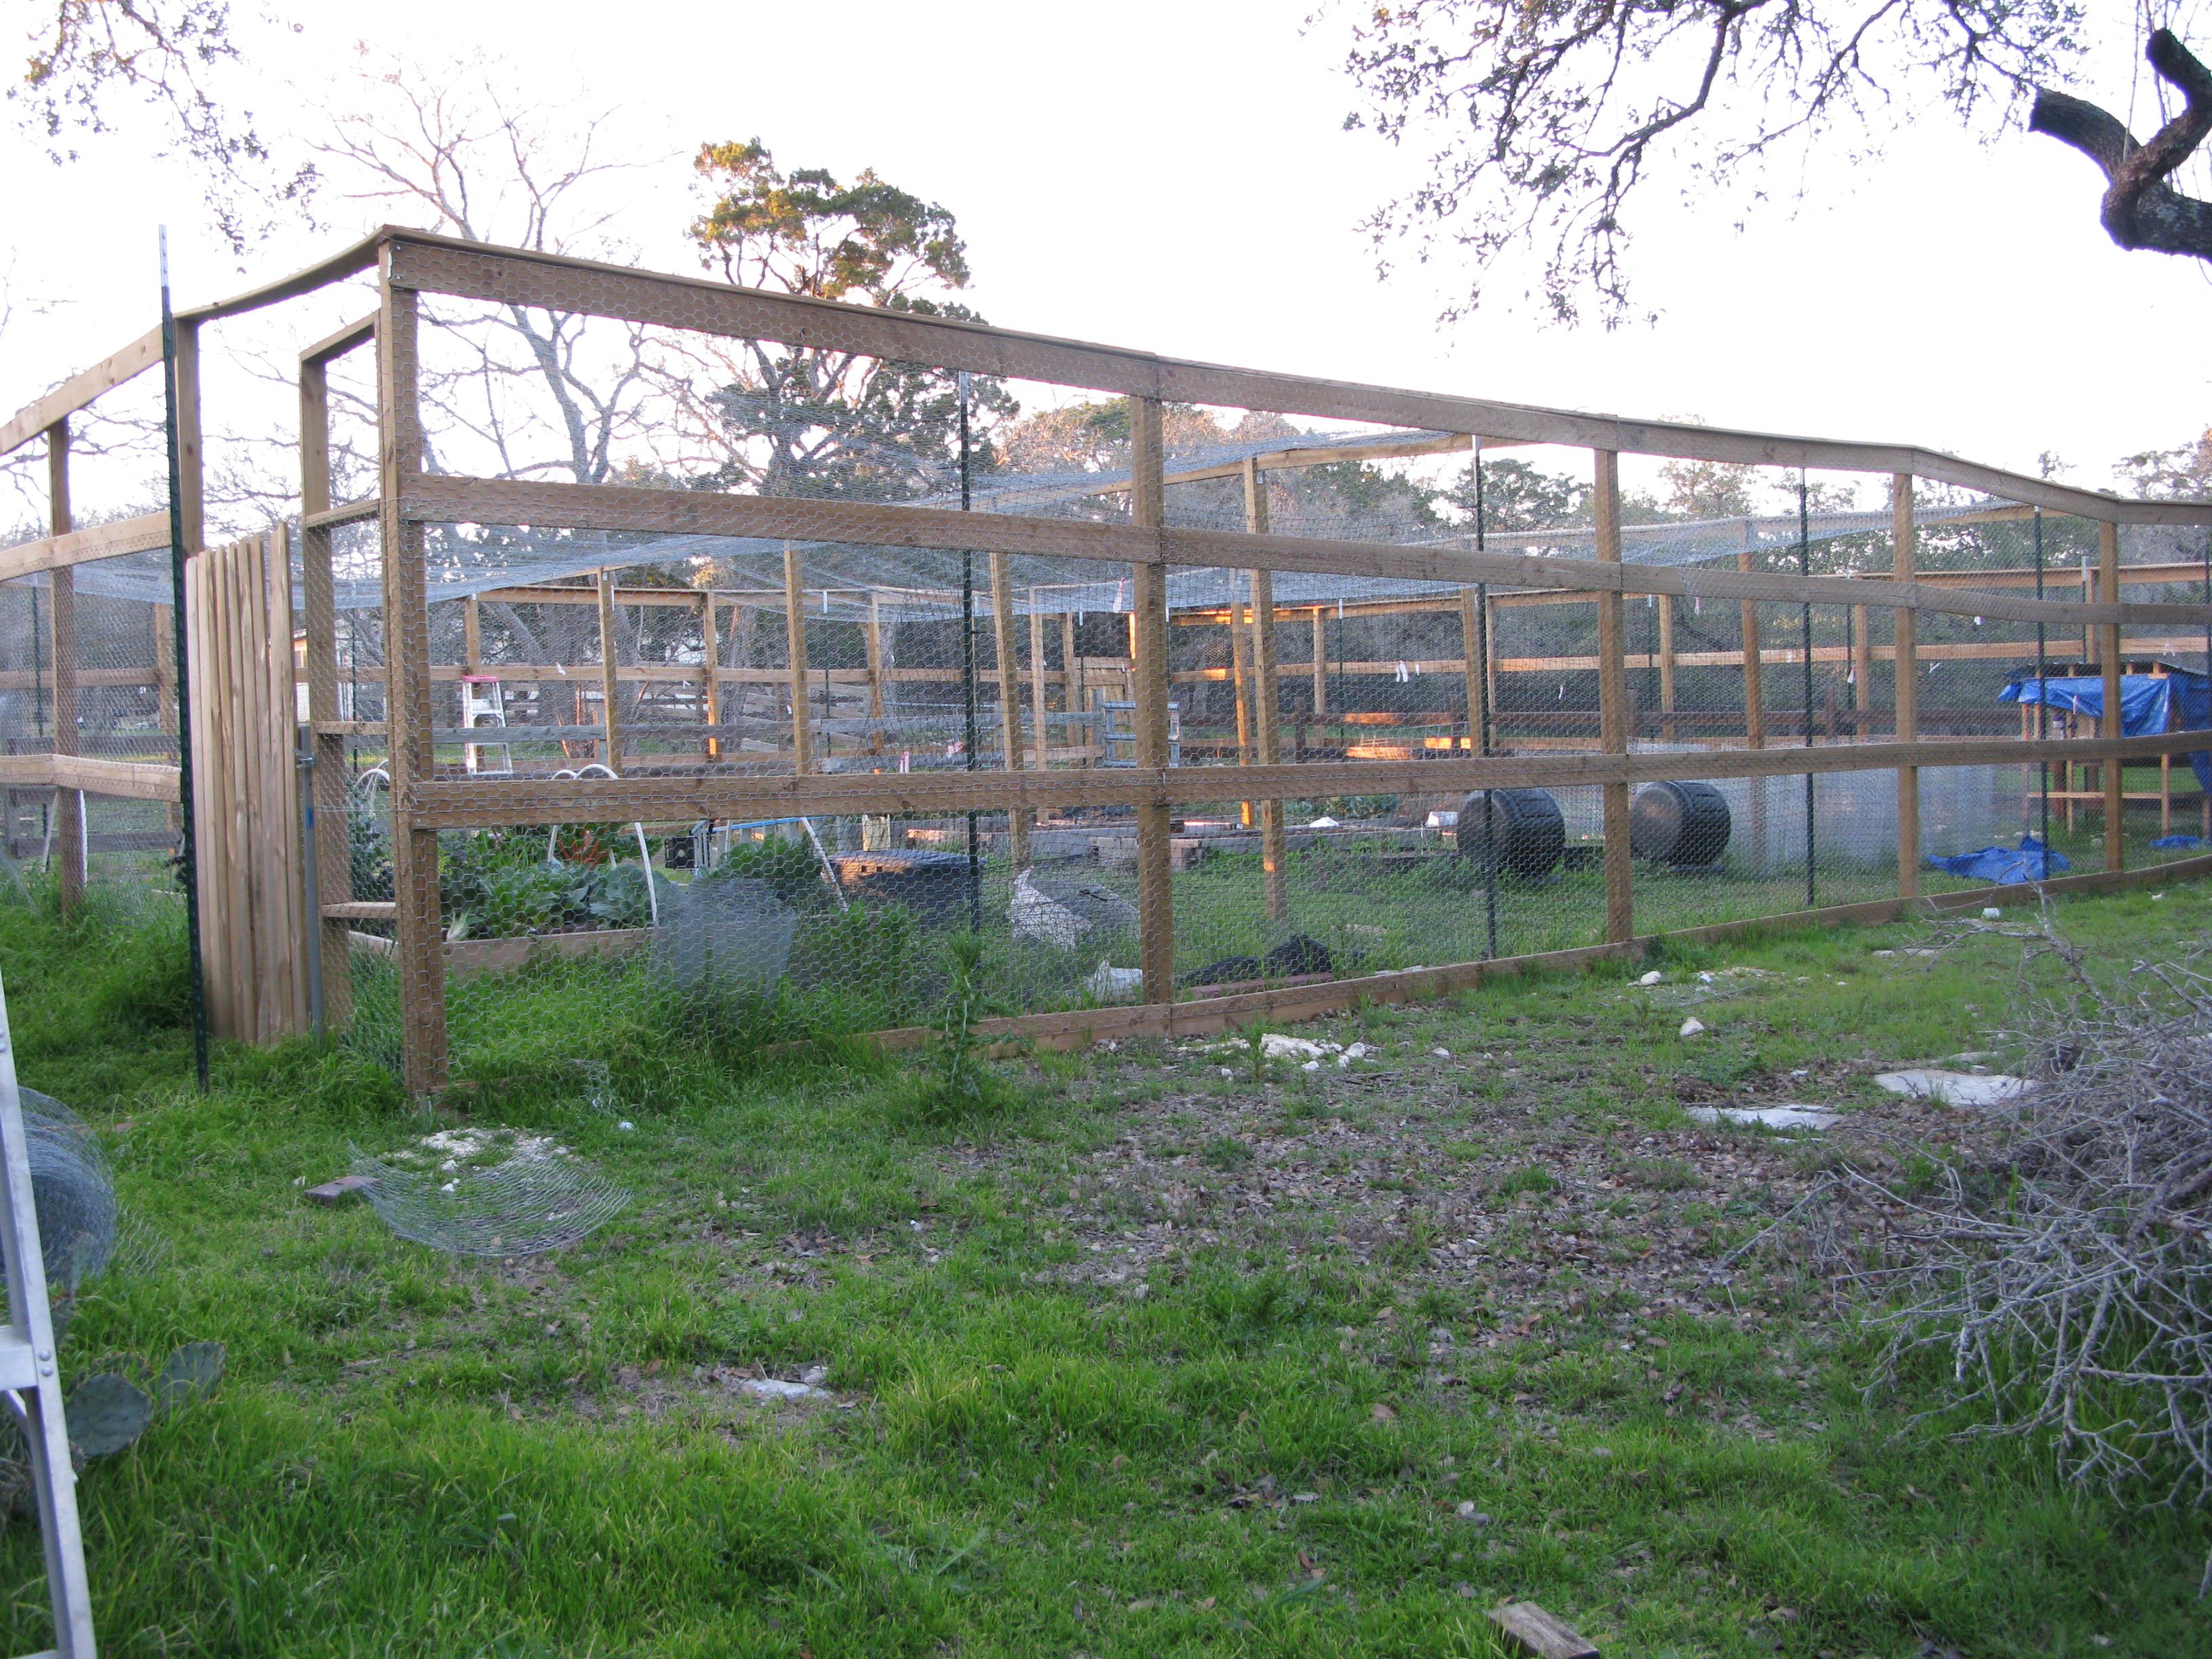 Garden Cage willsfamilyacres